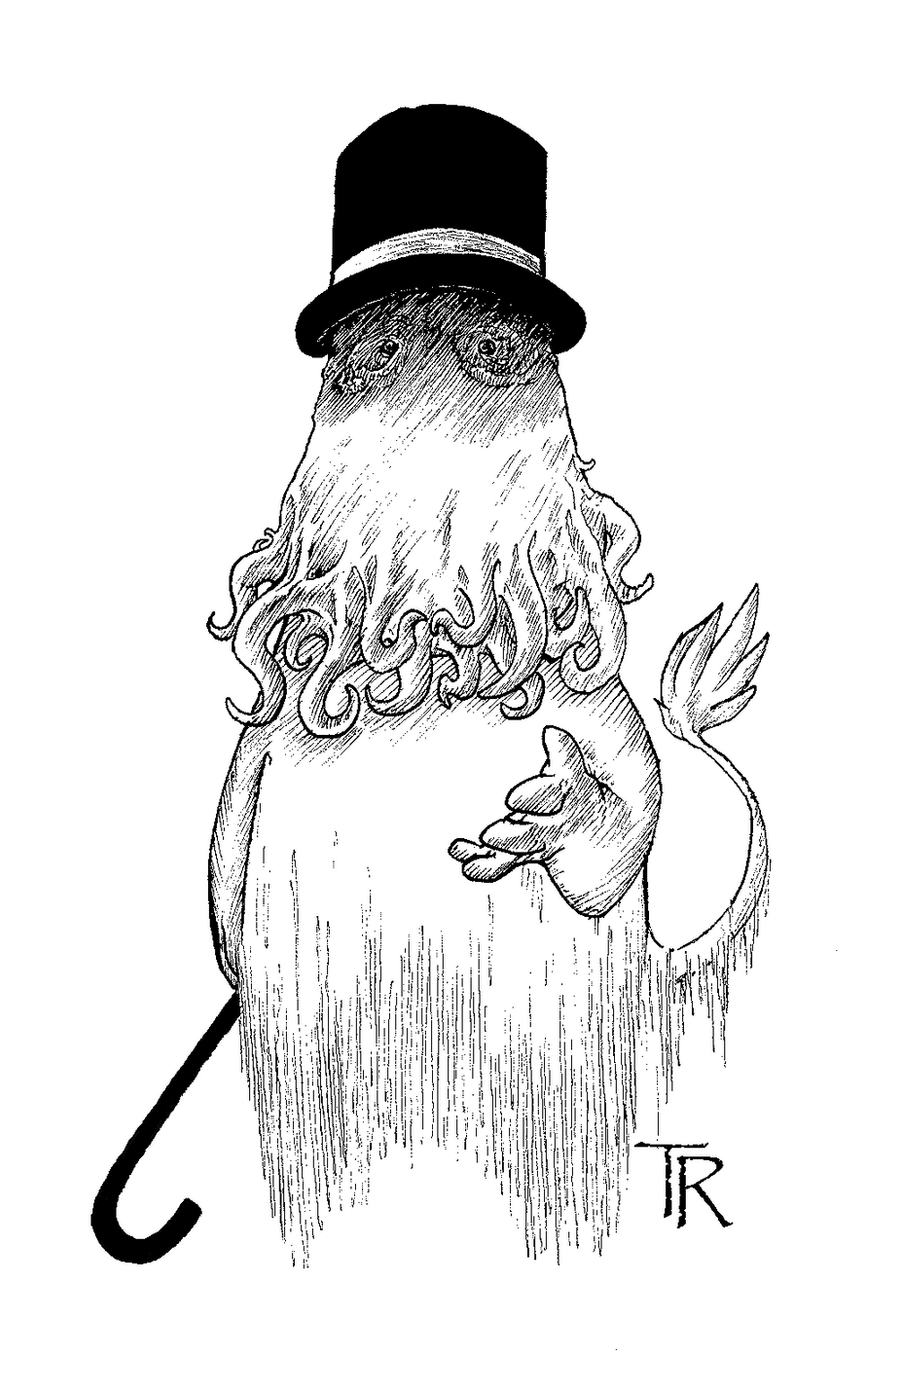 Moomin Cthulhu By Moreeni On Deviantart